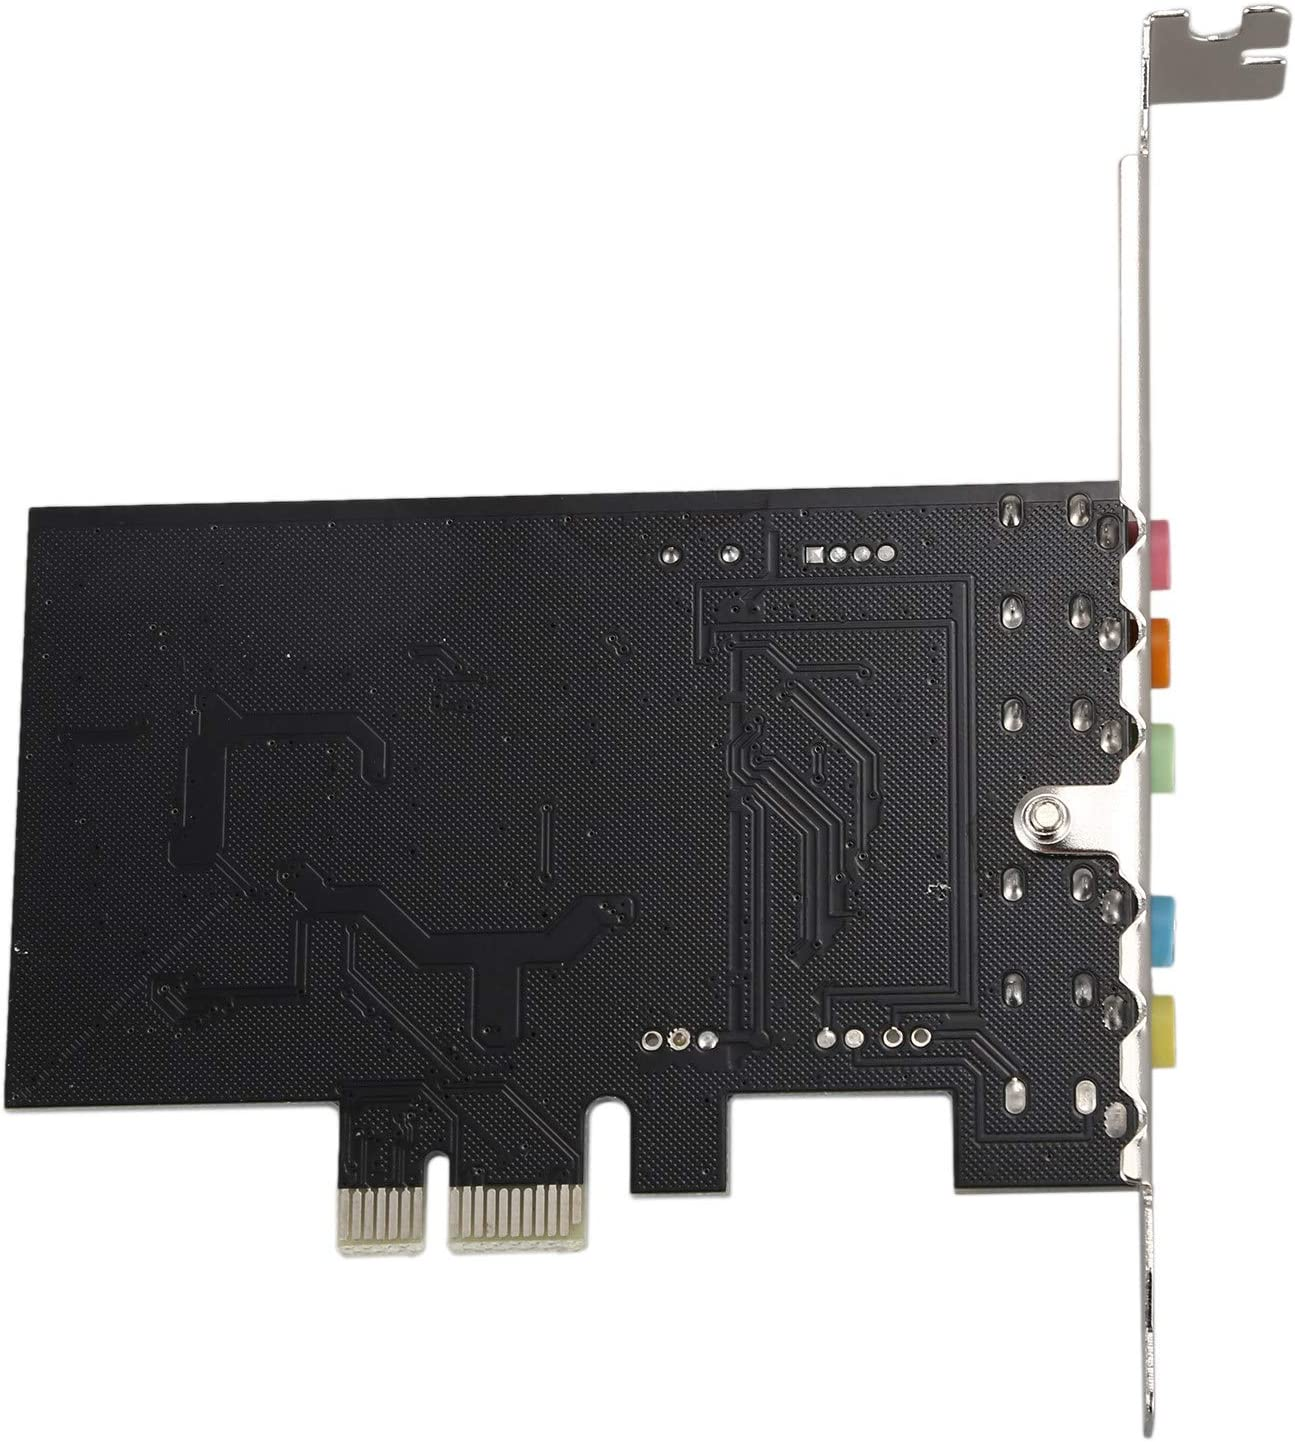 Monland PCI Express PCI-E 5.1 Channel 3D Audio 6 Channels Digital Sound Card For win XP